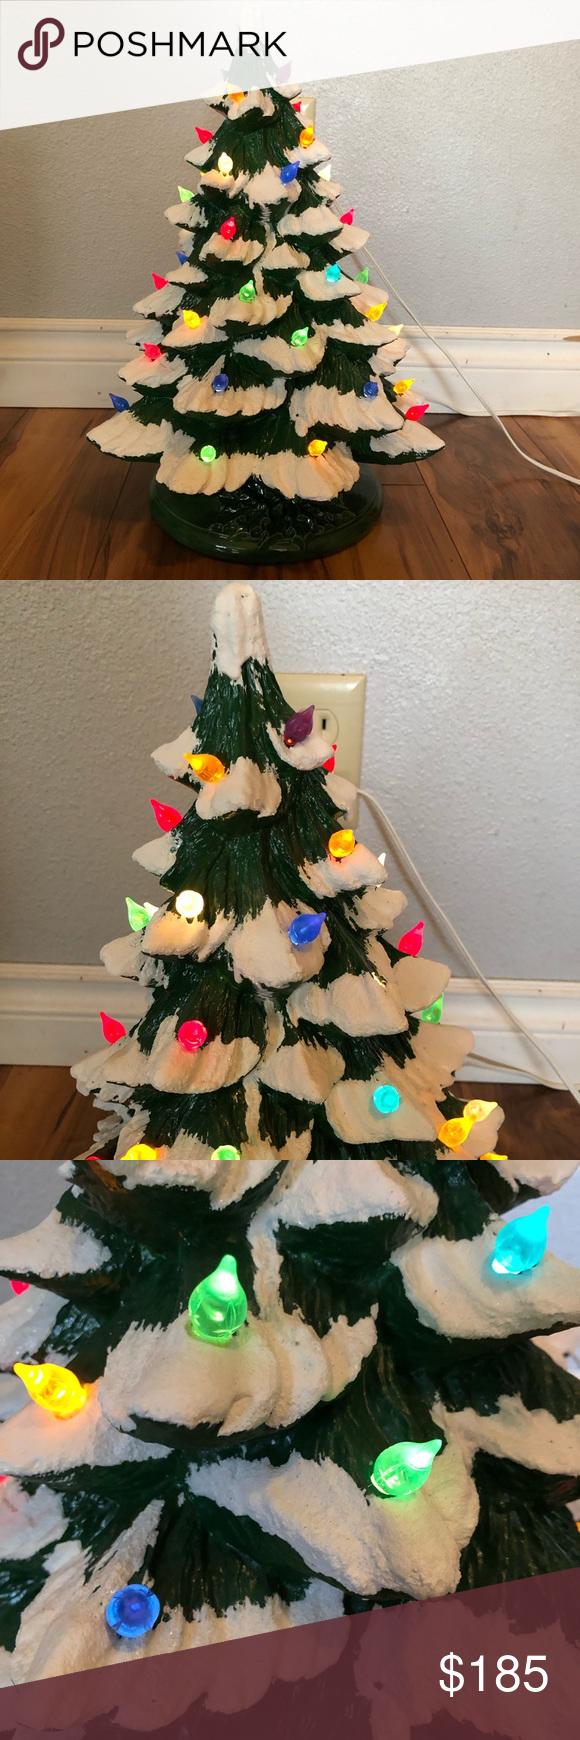 "Large Vintage 17"" light up Christmas tree w base Vintage"